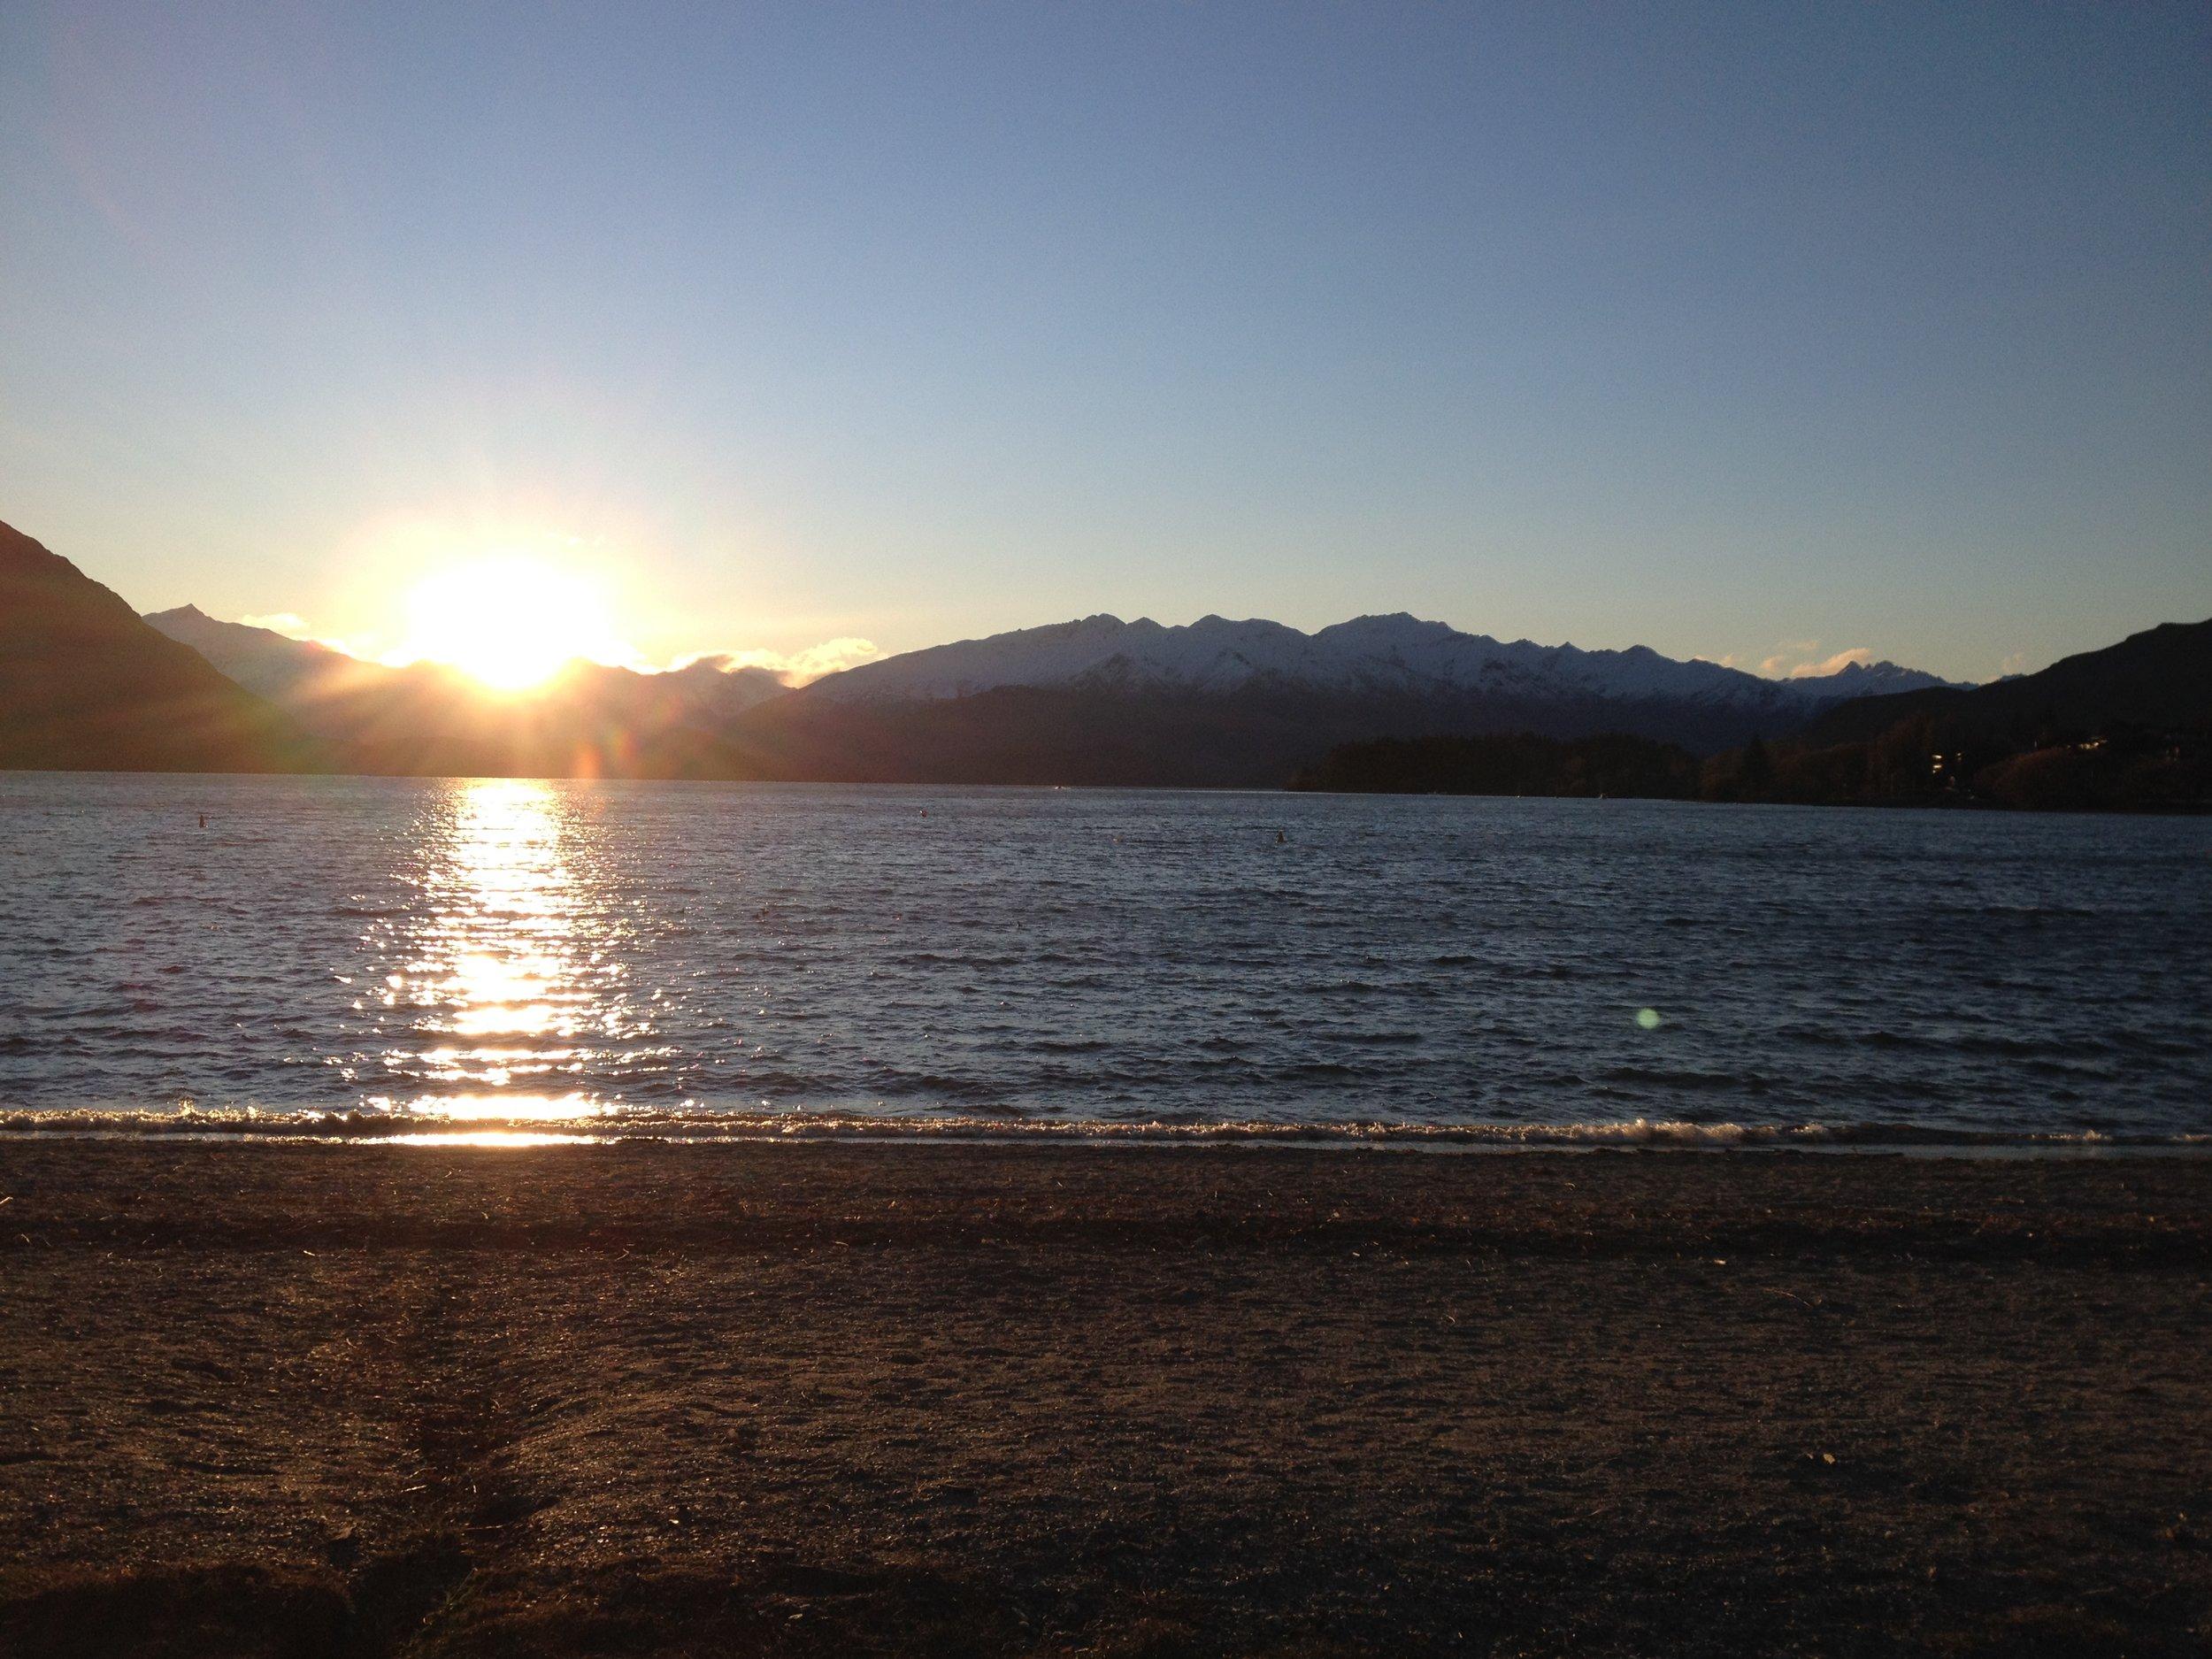 Sunset in Lake Wanaka